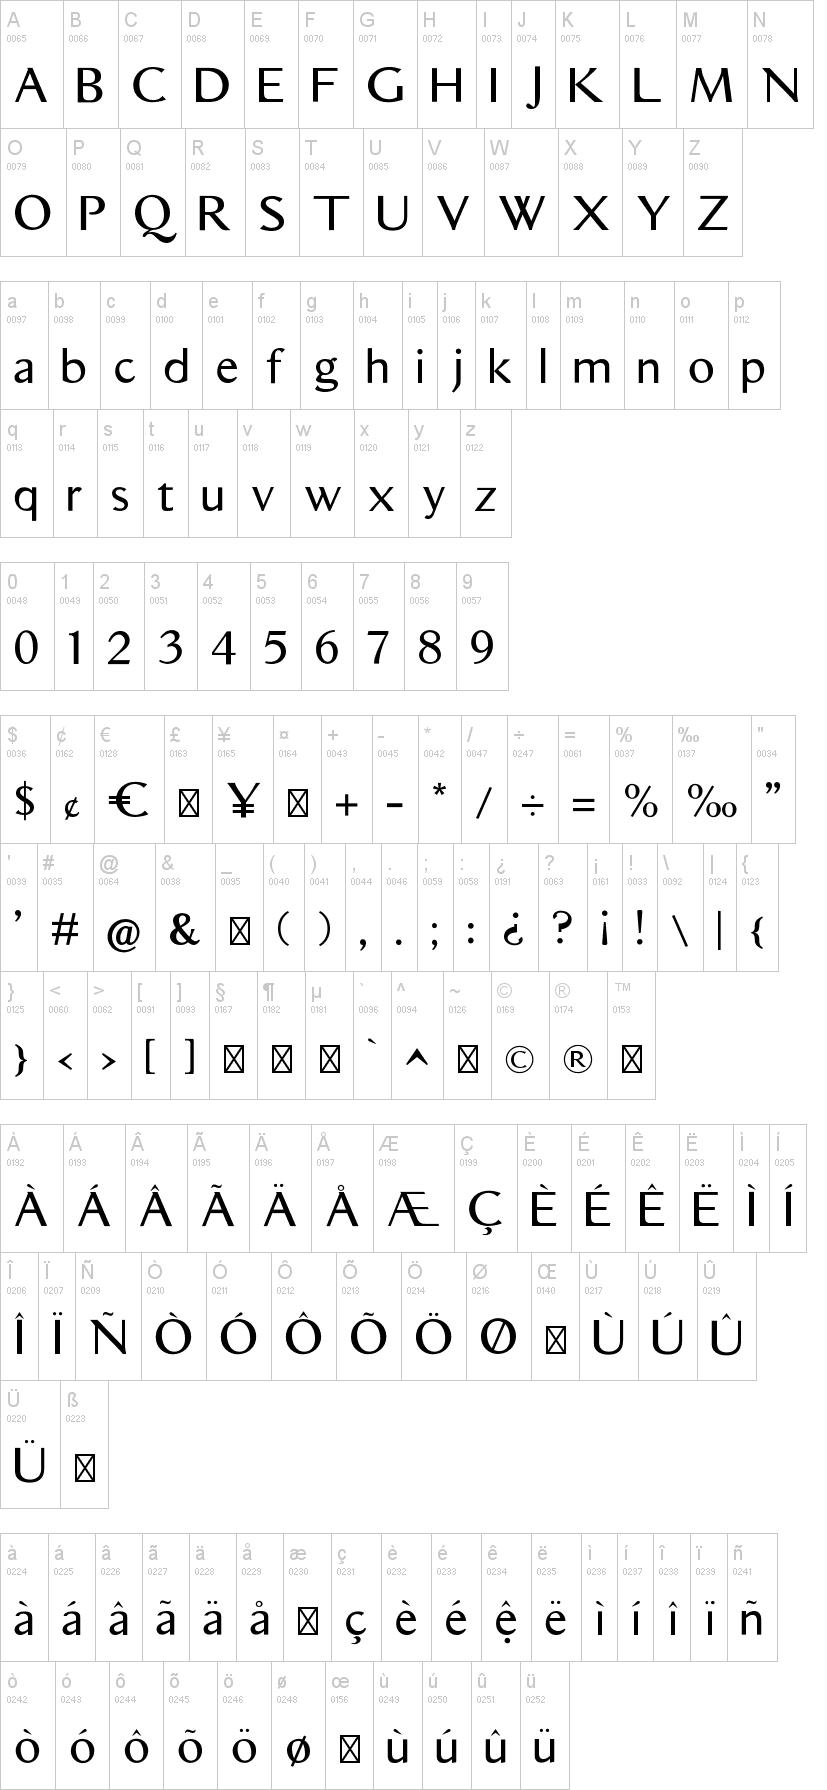 Download free aristocrat normal font | dafontfree. Net.